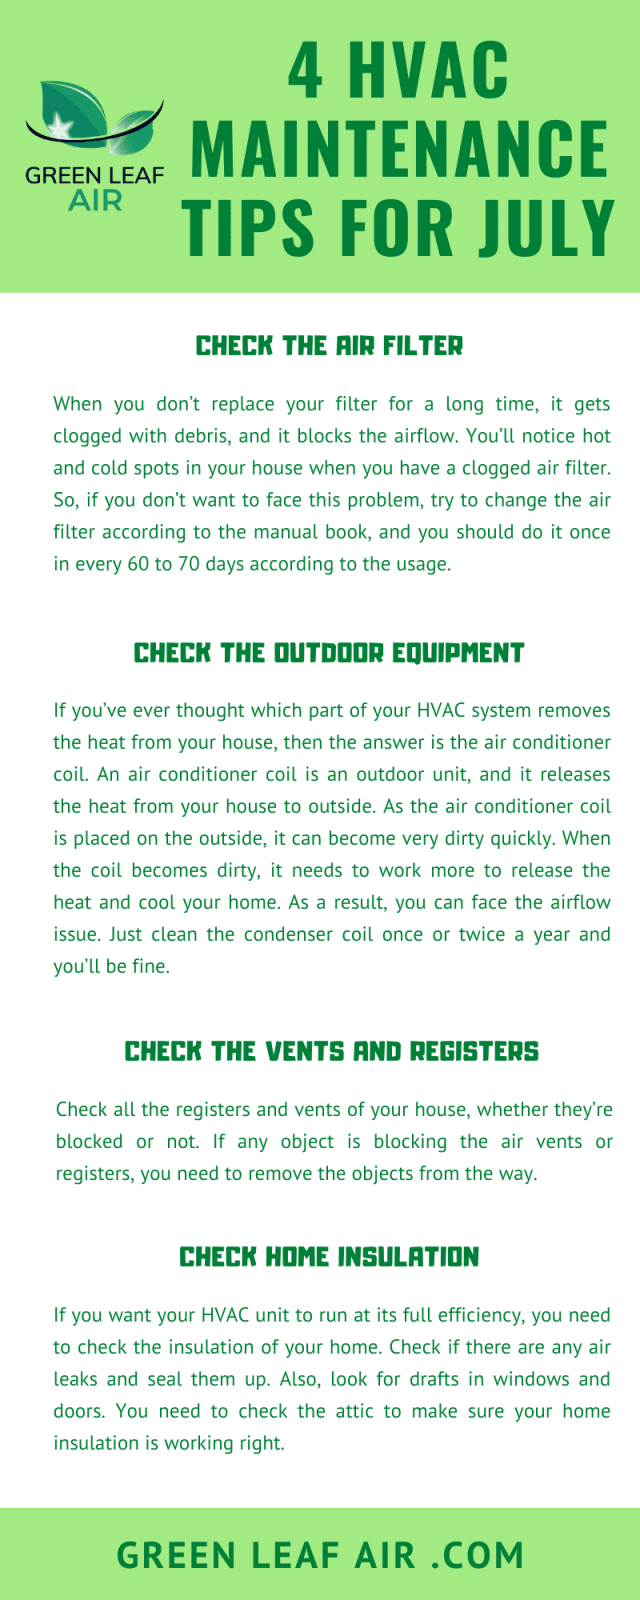 4 HVAC Maintenance Tips for July